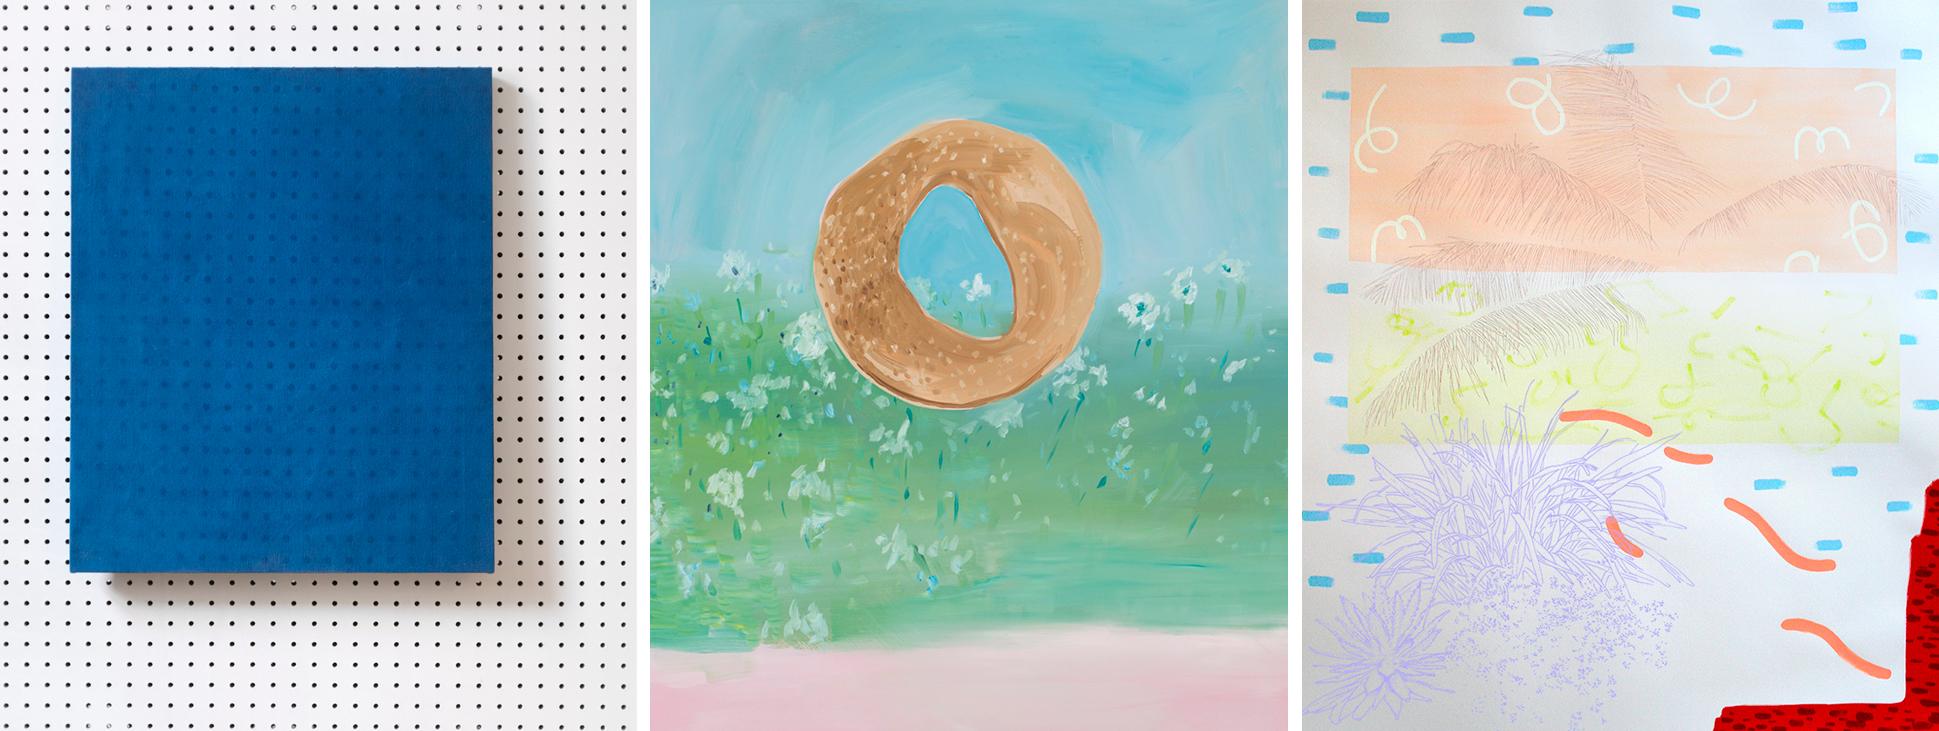 Tangerine Dream Collective 2.jpg